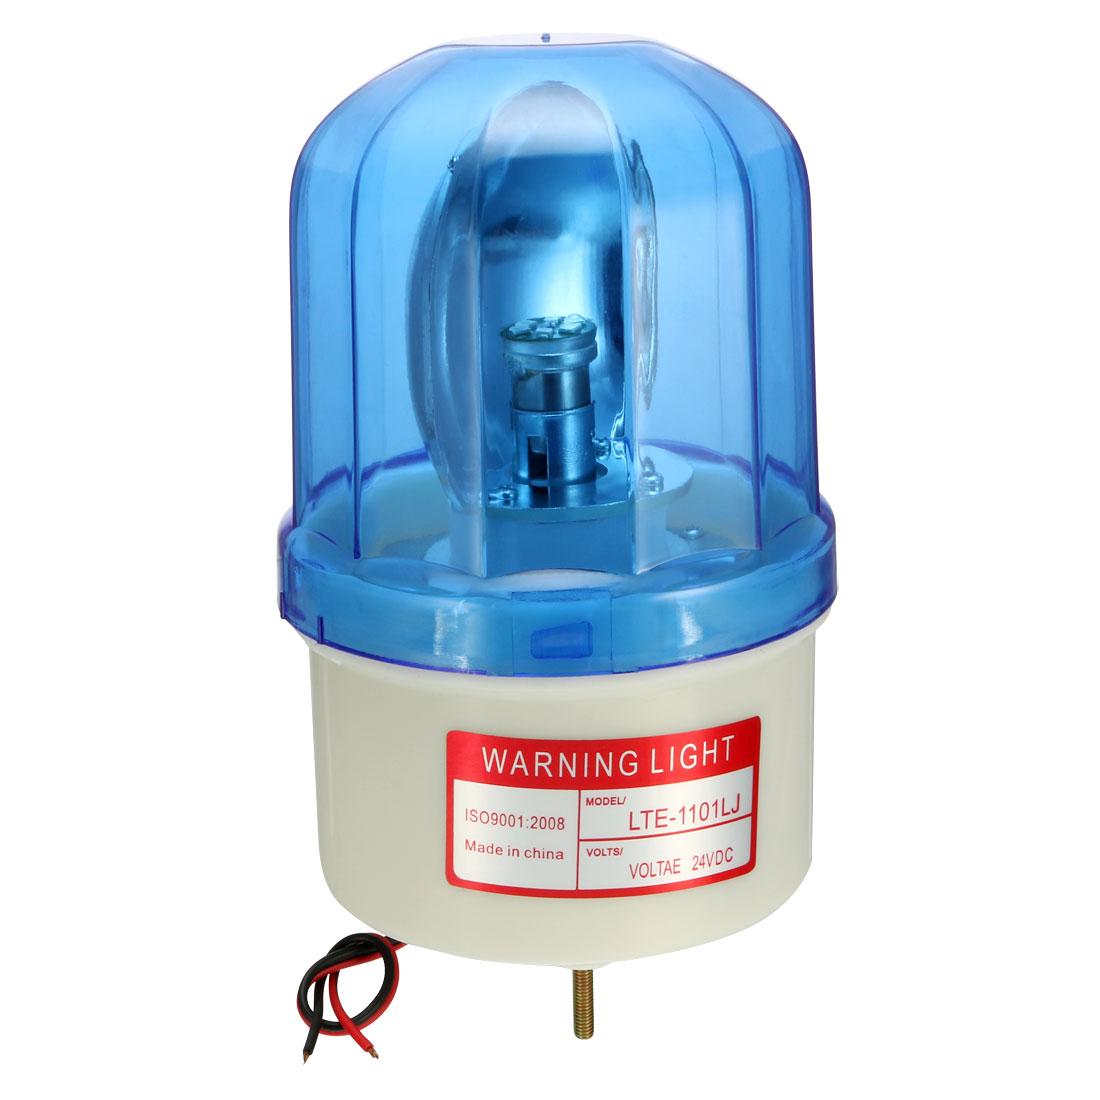 LED Warning Light Rotating Flash Signal Lamp Buzzer 90dB DC 24V Blue LTE1101LJ